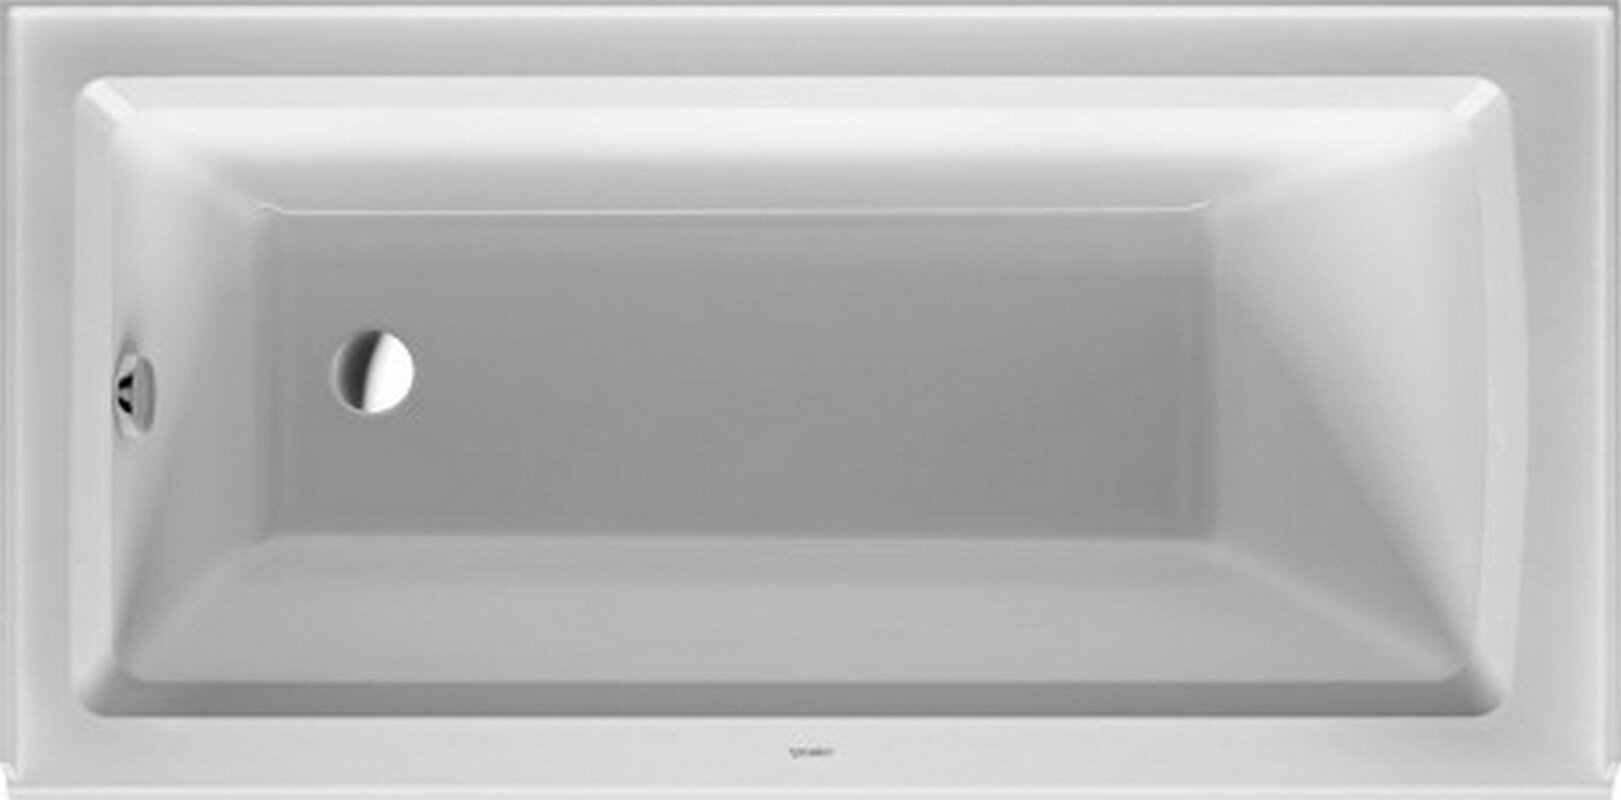 30 x 2 person japanese soaking tub. duravit architec 60 x 30 soaking bathtub reviews wayfair Deep Soaking Tub 5  X designs ergonomic oval cast iron drop in 2 person japanese fruitesborras com 100 Person Japanese Images